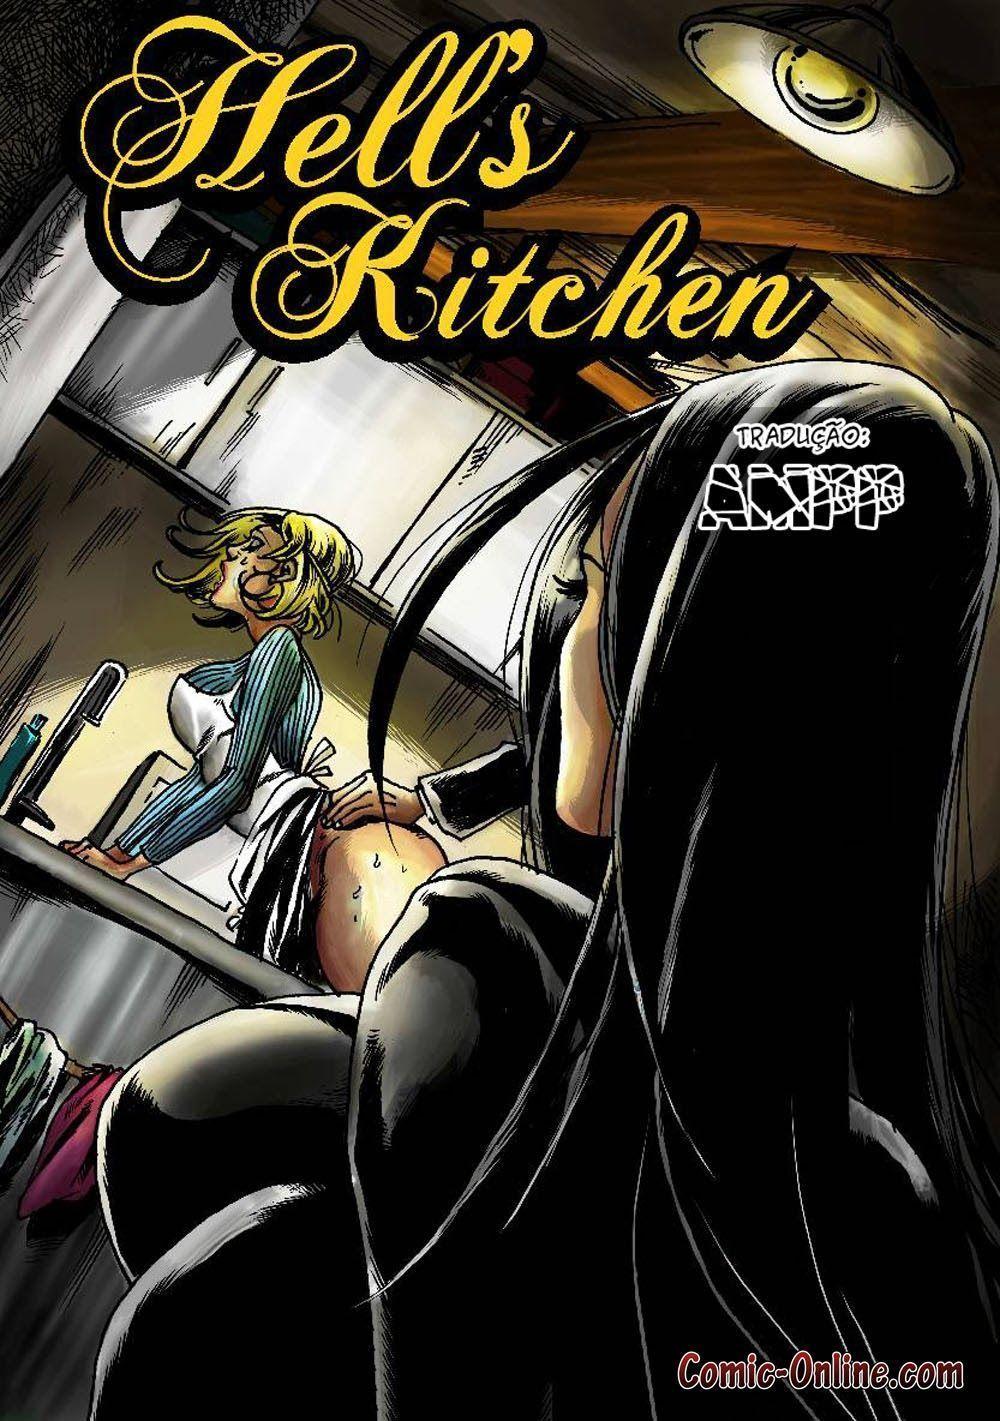 Hentai Bizarro - Hells Kitchen - HQ Erótico